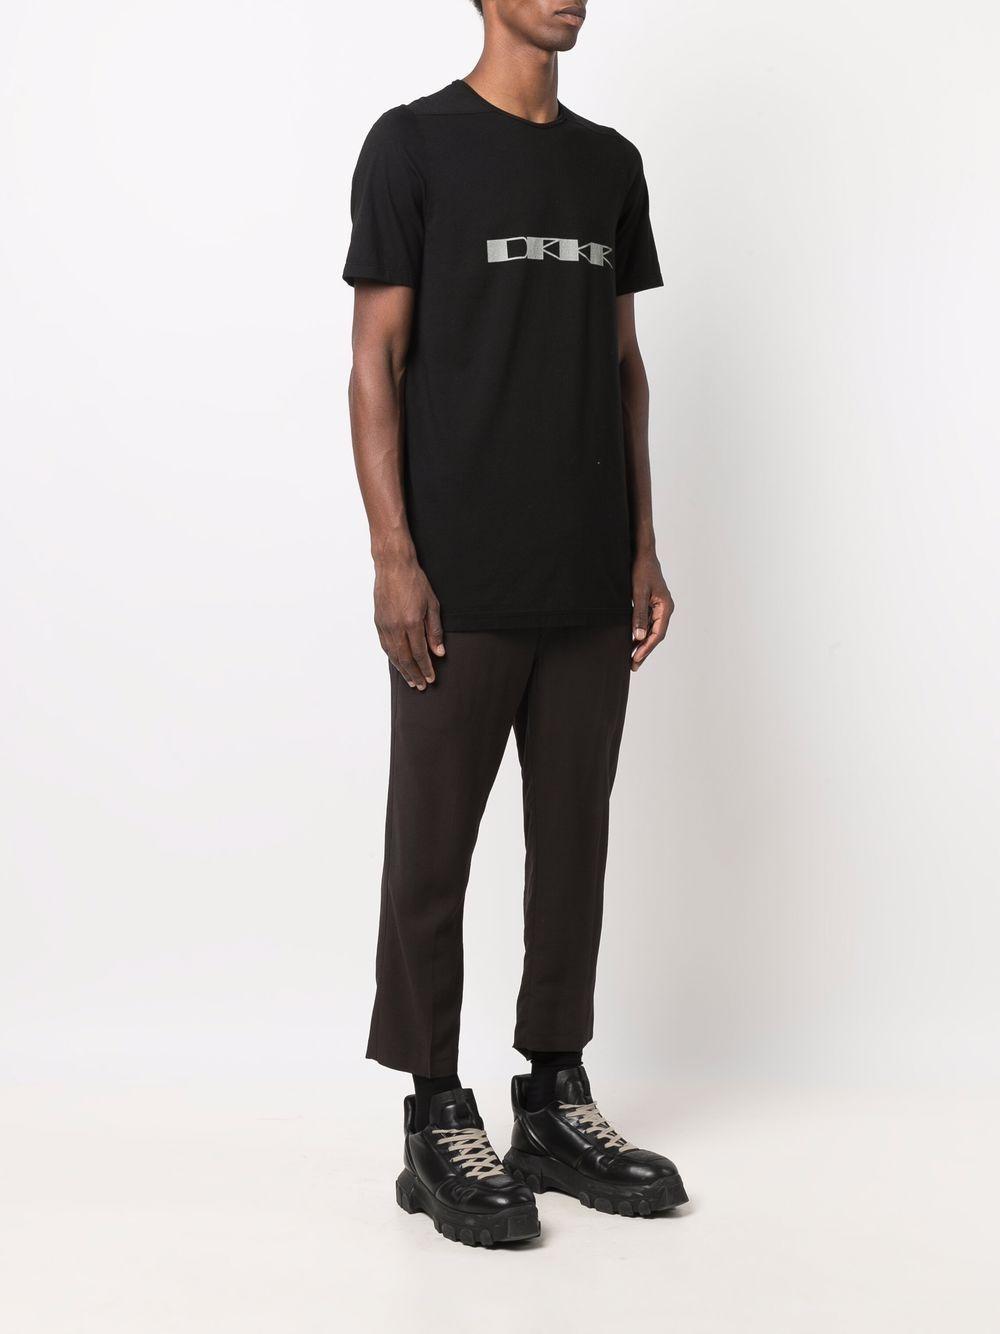 level t-shirt man black in cotton RICK OWENS DRKSHDW   T-shirts   DU02A3250 RNEP60961